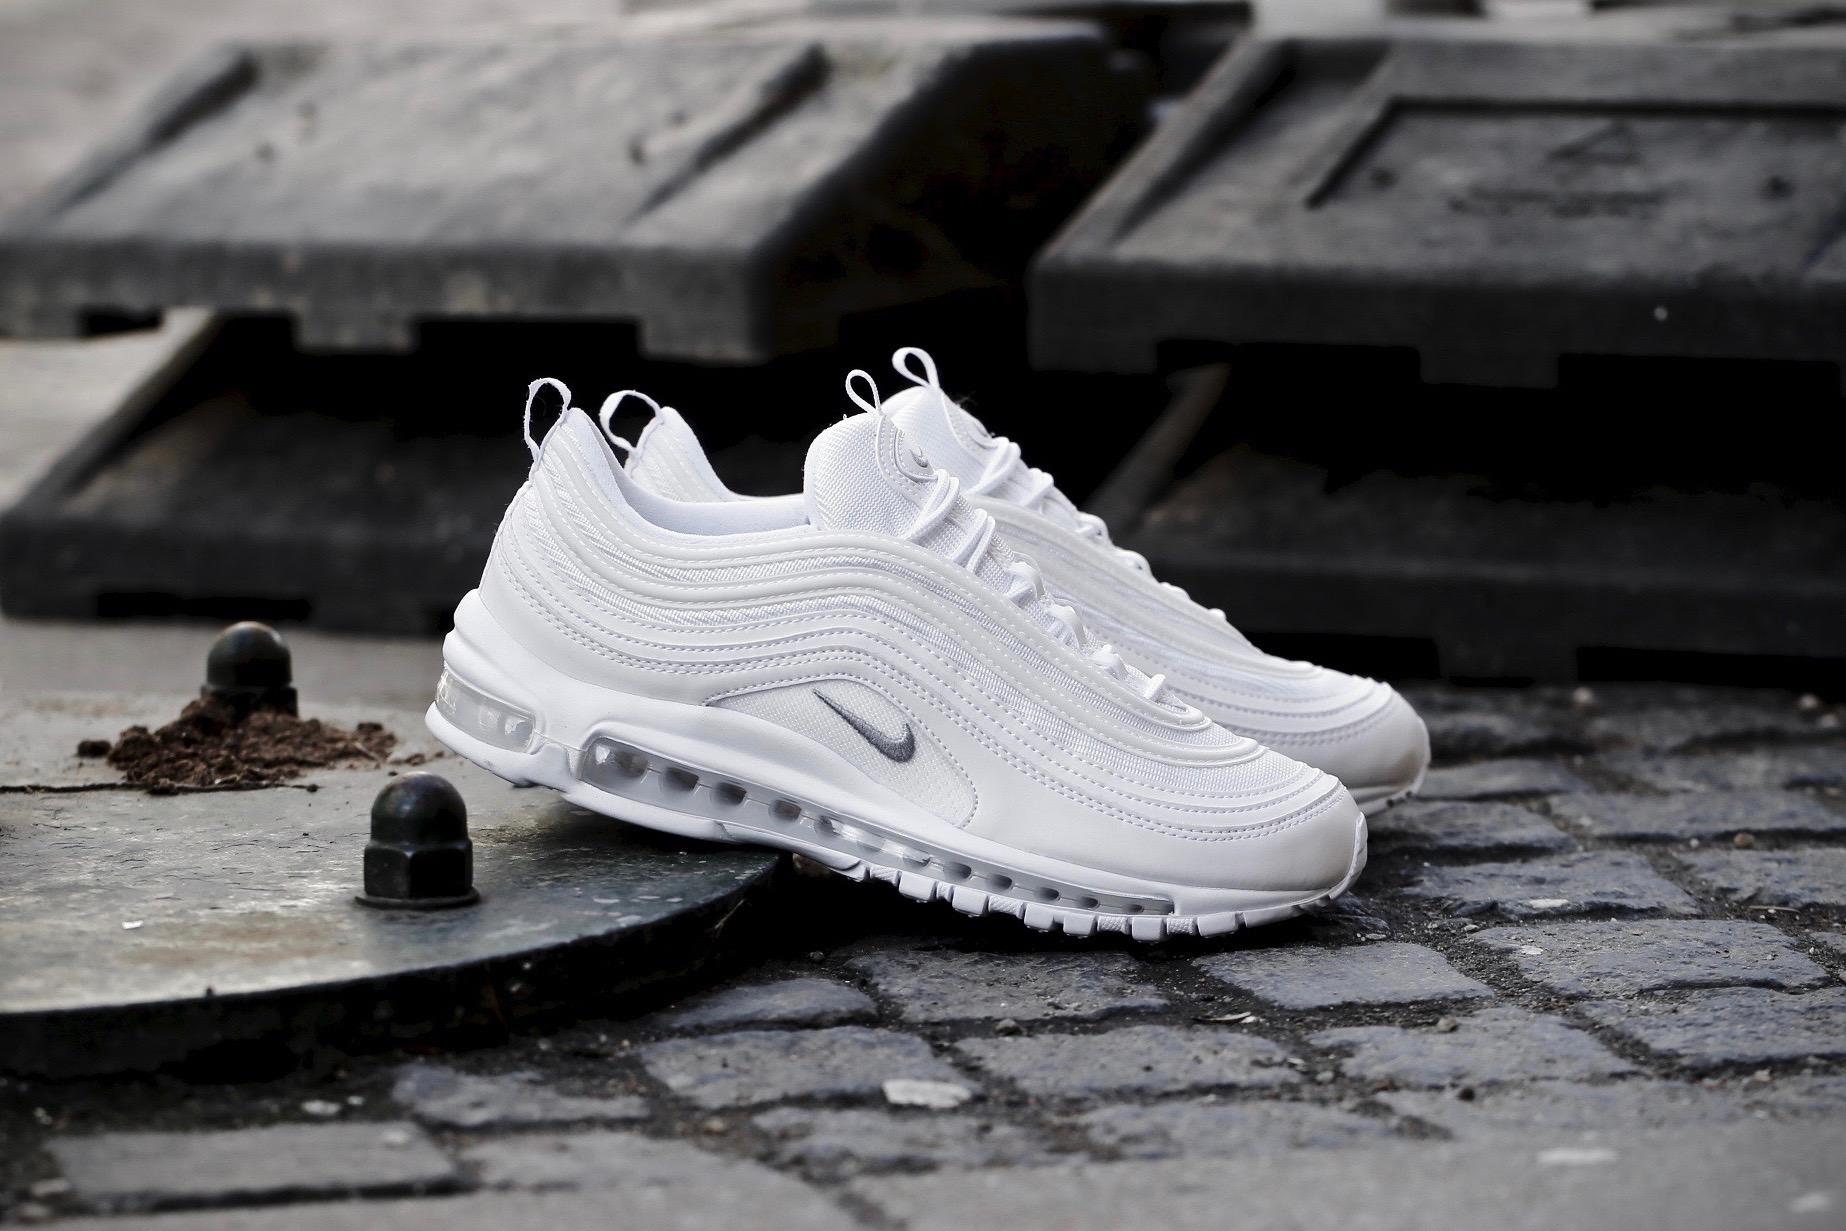 Nike Air Max 97 shoes white grey